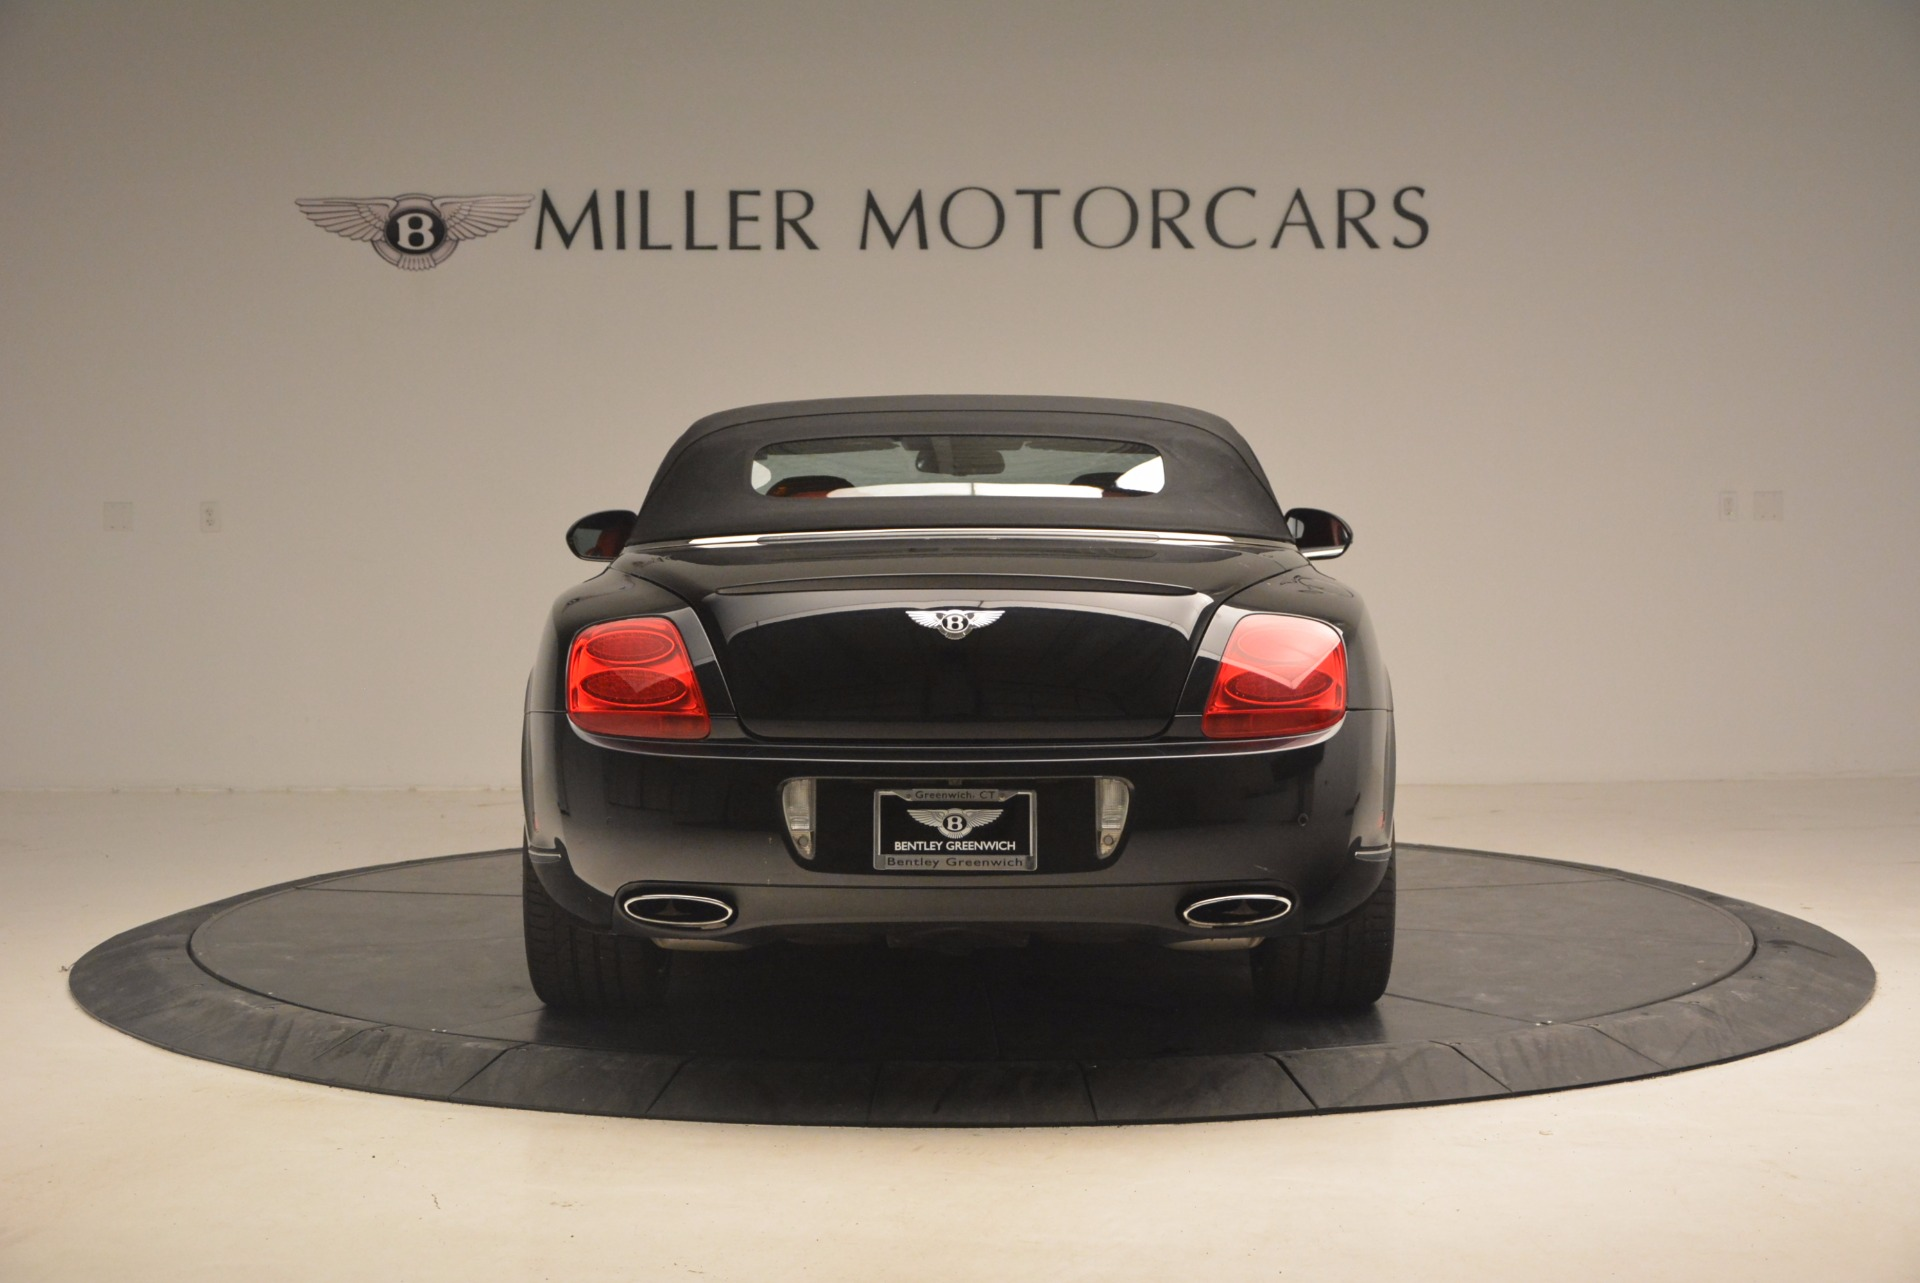 Used 2010 Bentley Continental GT Speed For Sale In Westport, CT 1298_p19